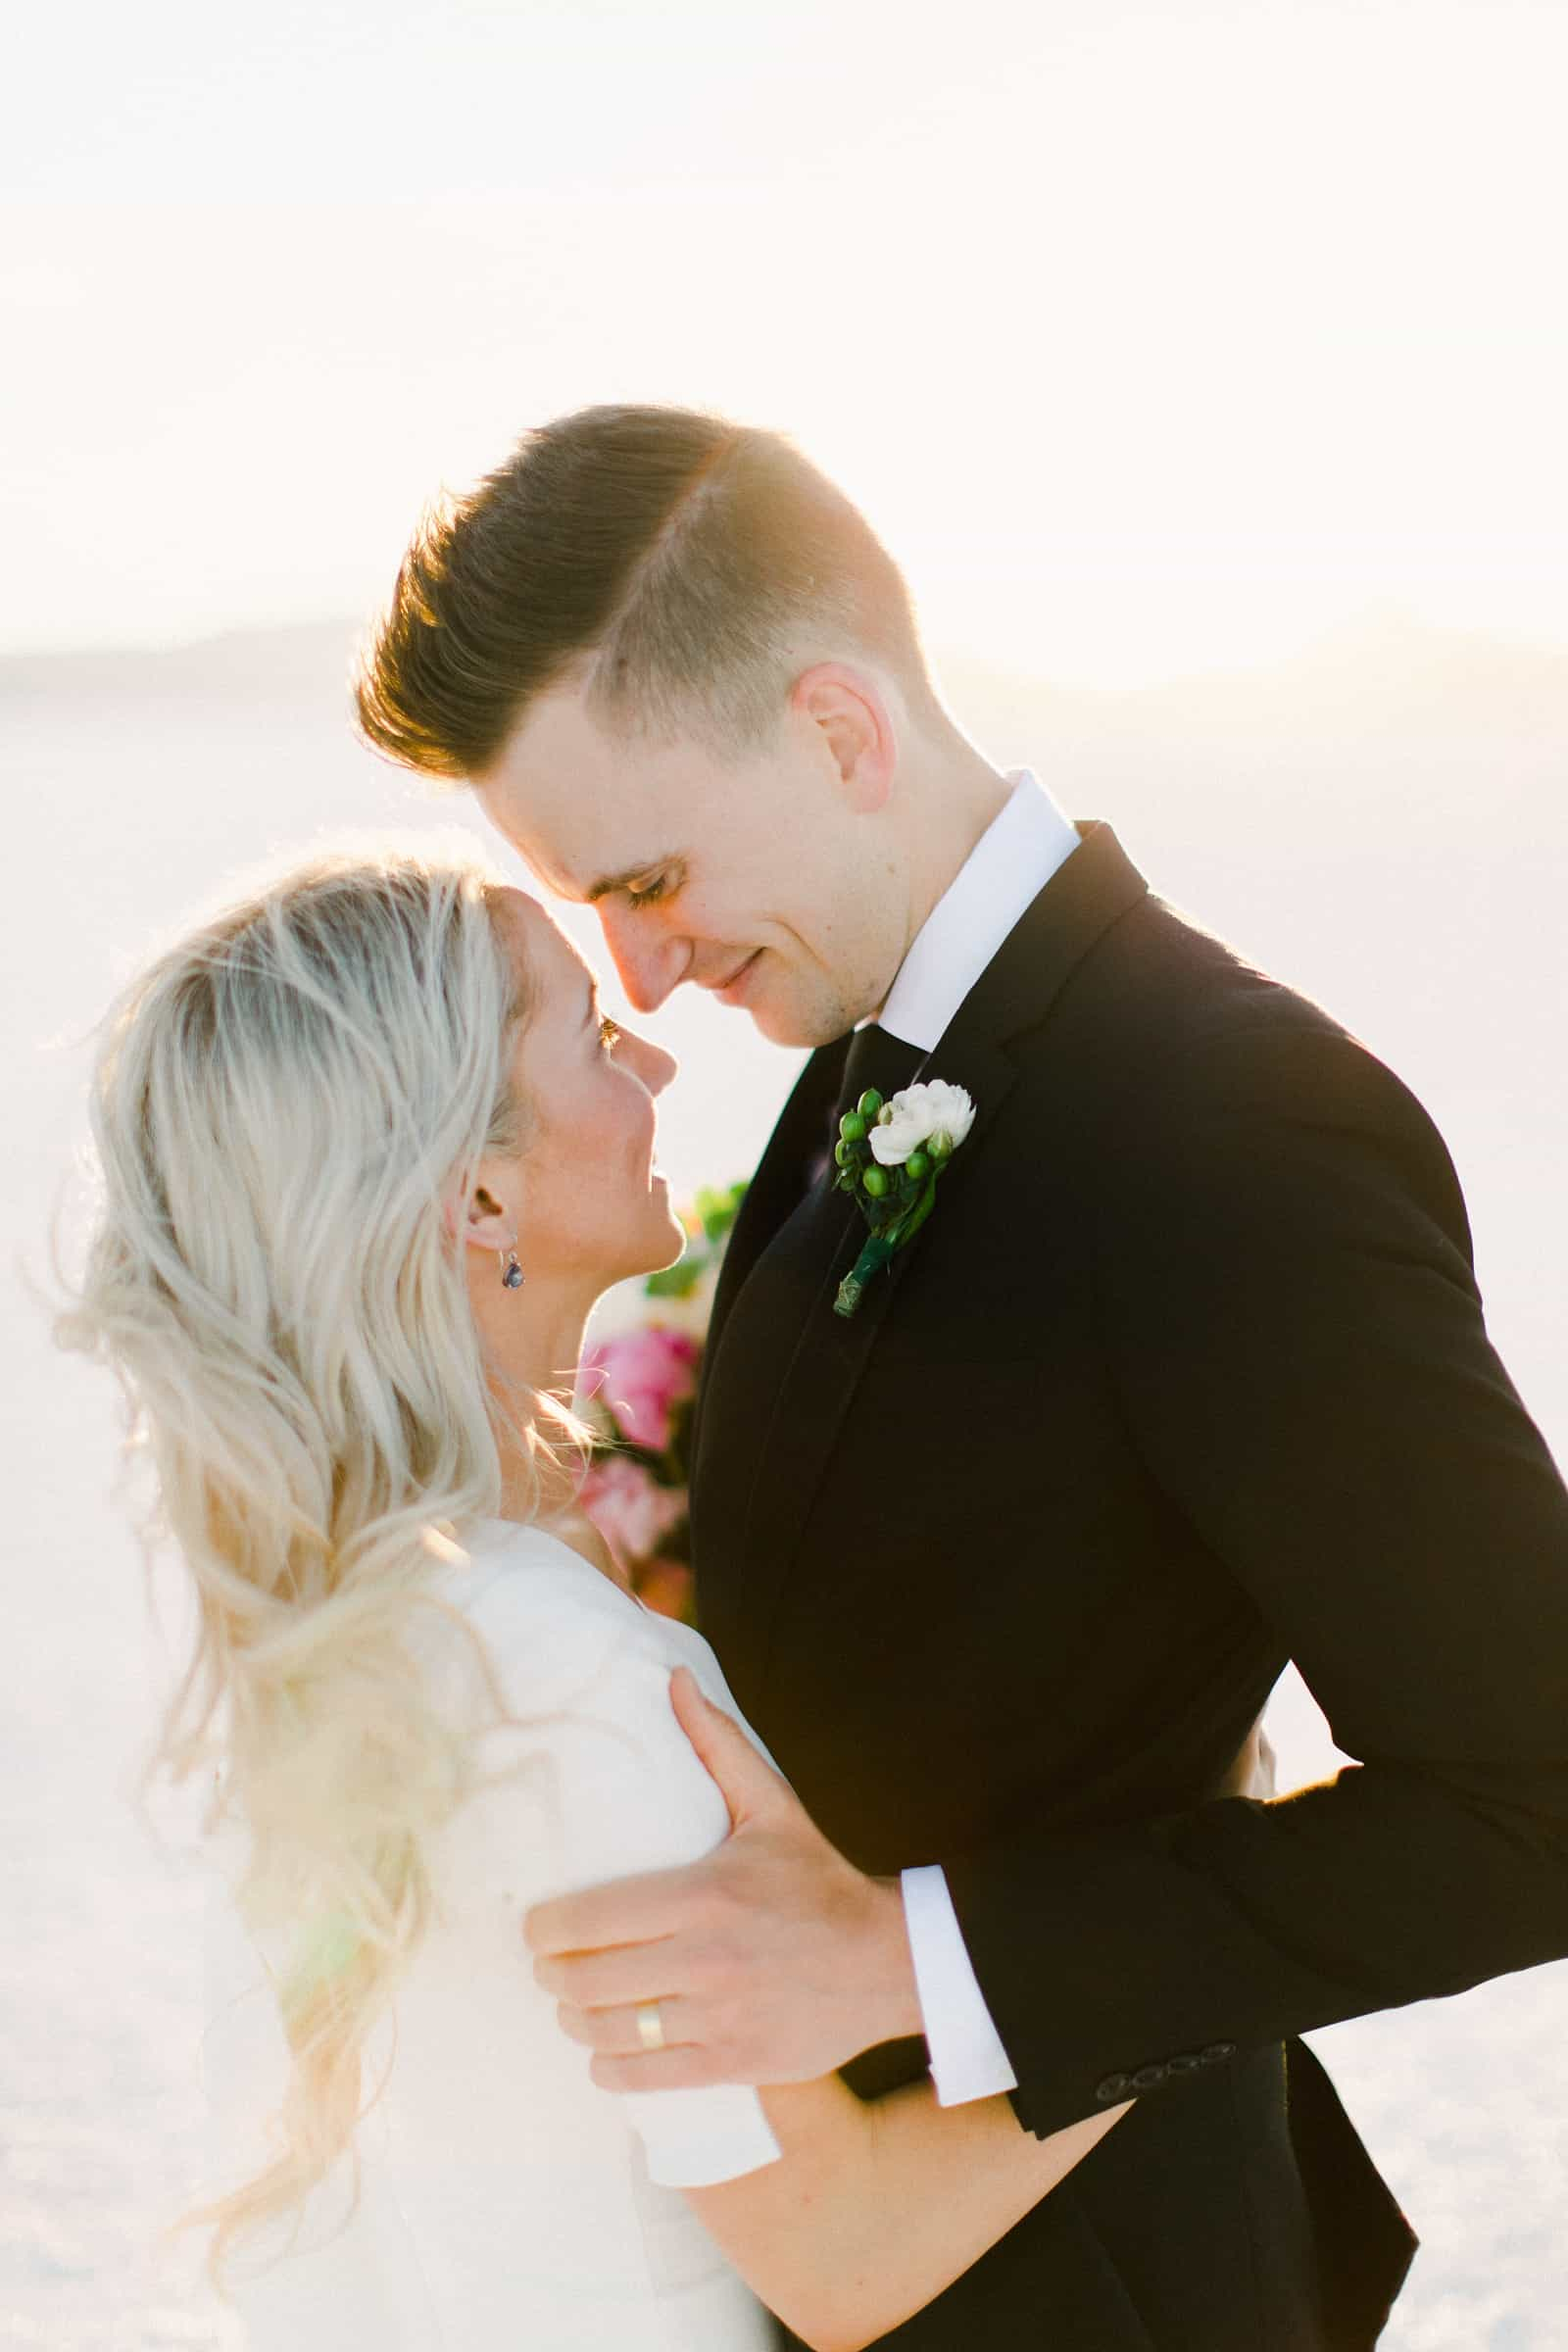 Bonneville Salt Flats Utah Wedding Photography, destination wedding, bride and groom first look